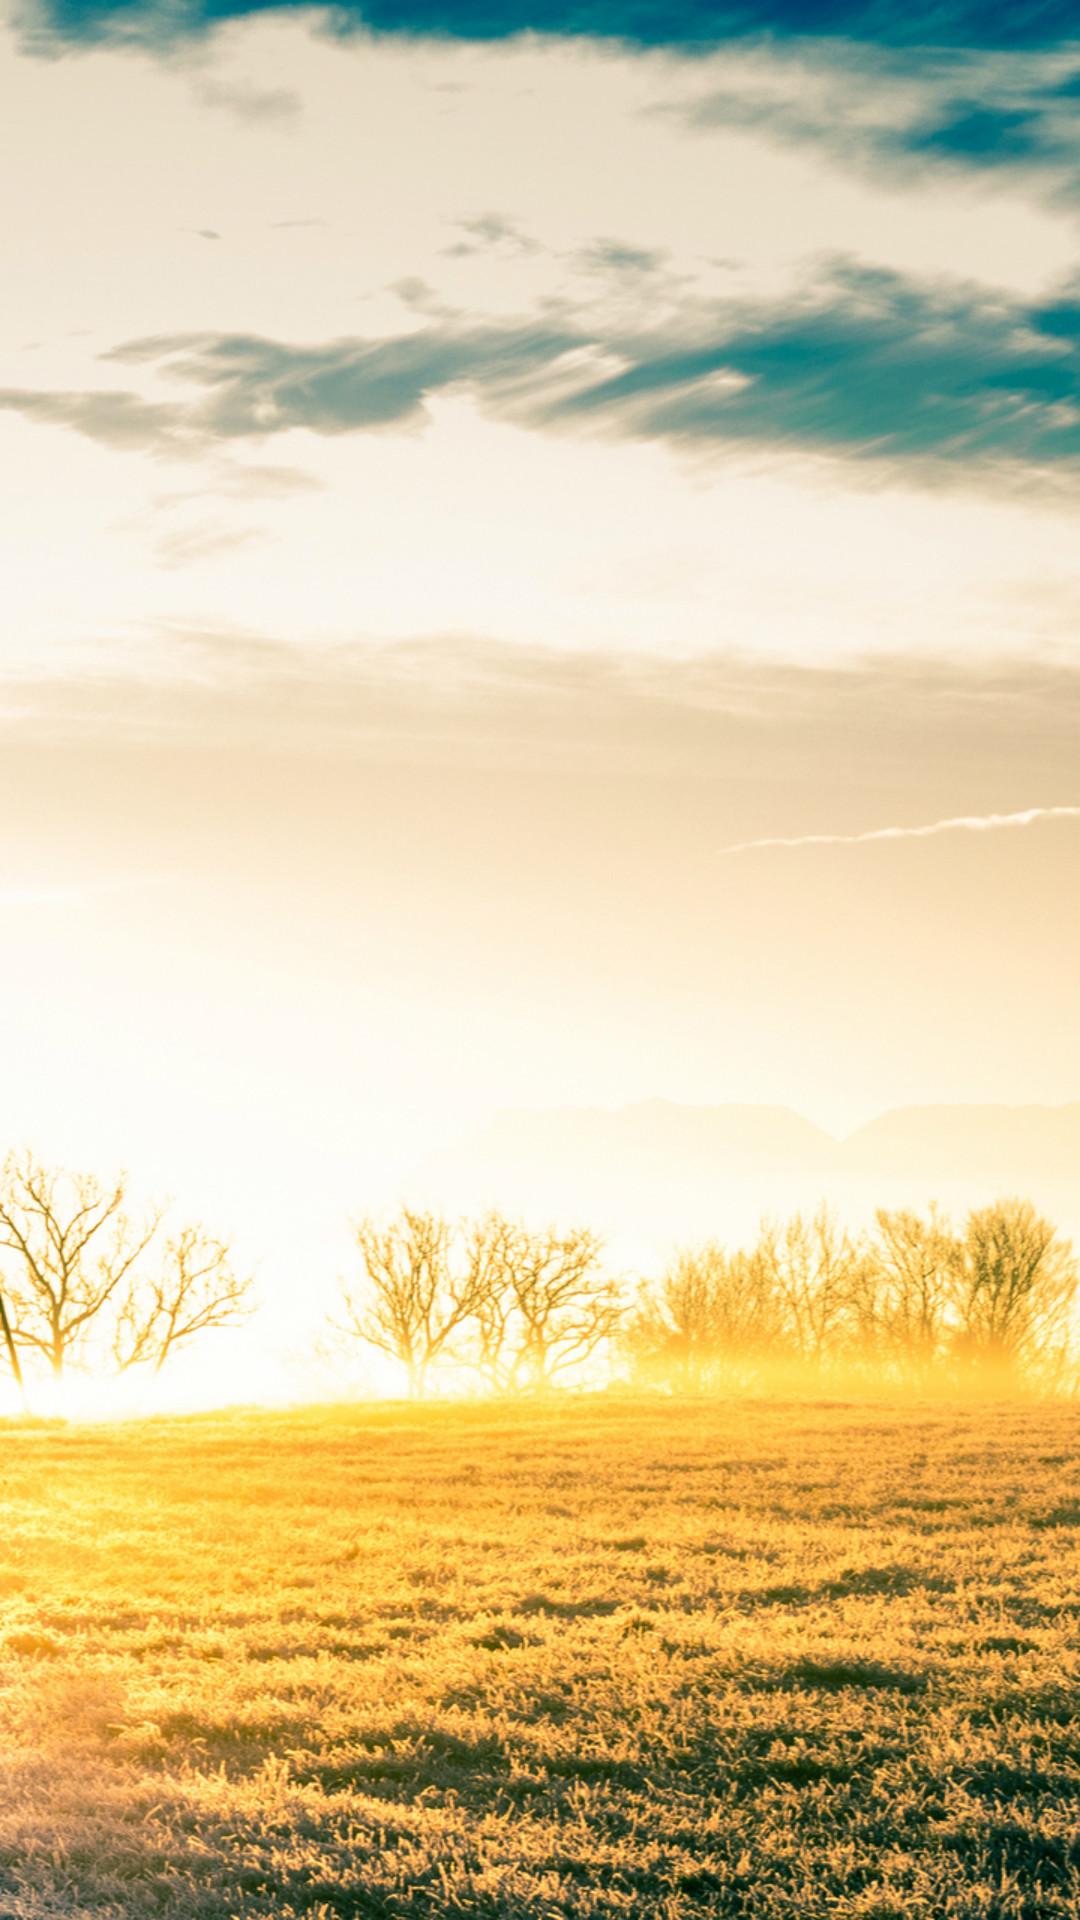 Vast Bright Golden Wither Grass Field iPhone 7 wallpaper